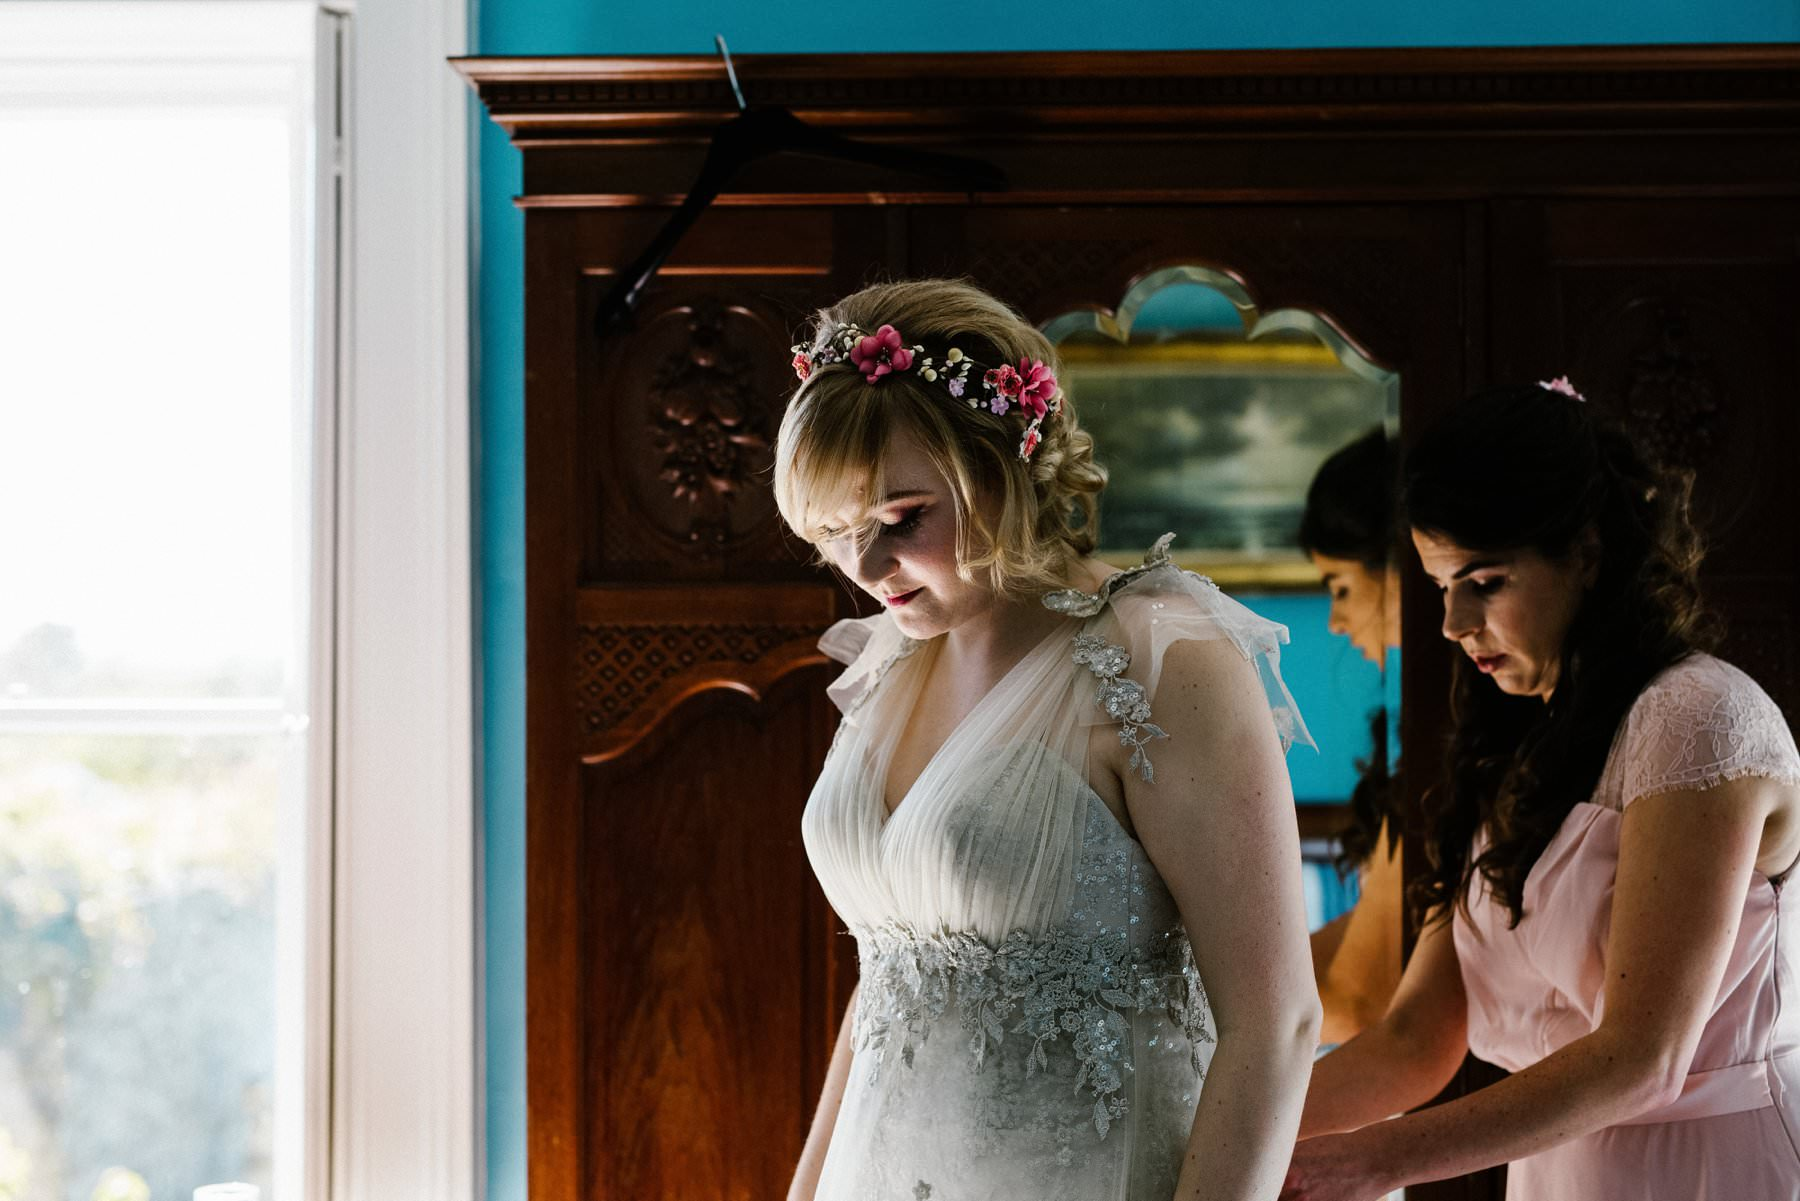 segrave house wedding photography